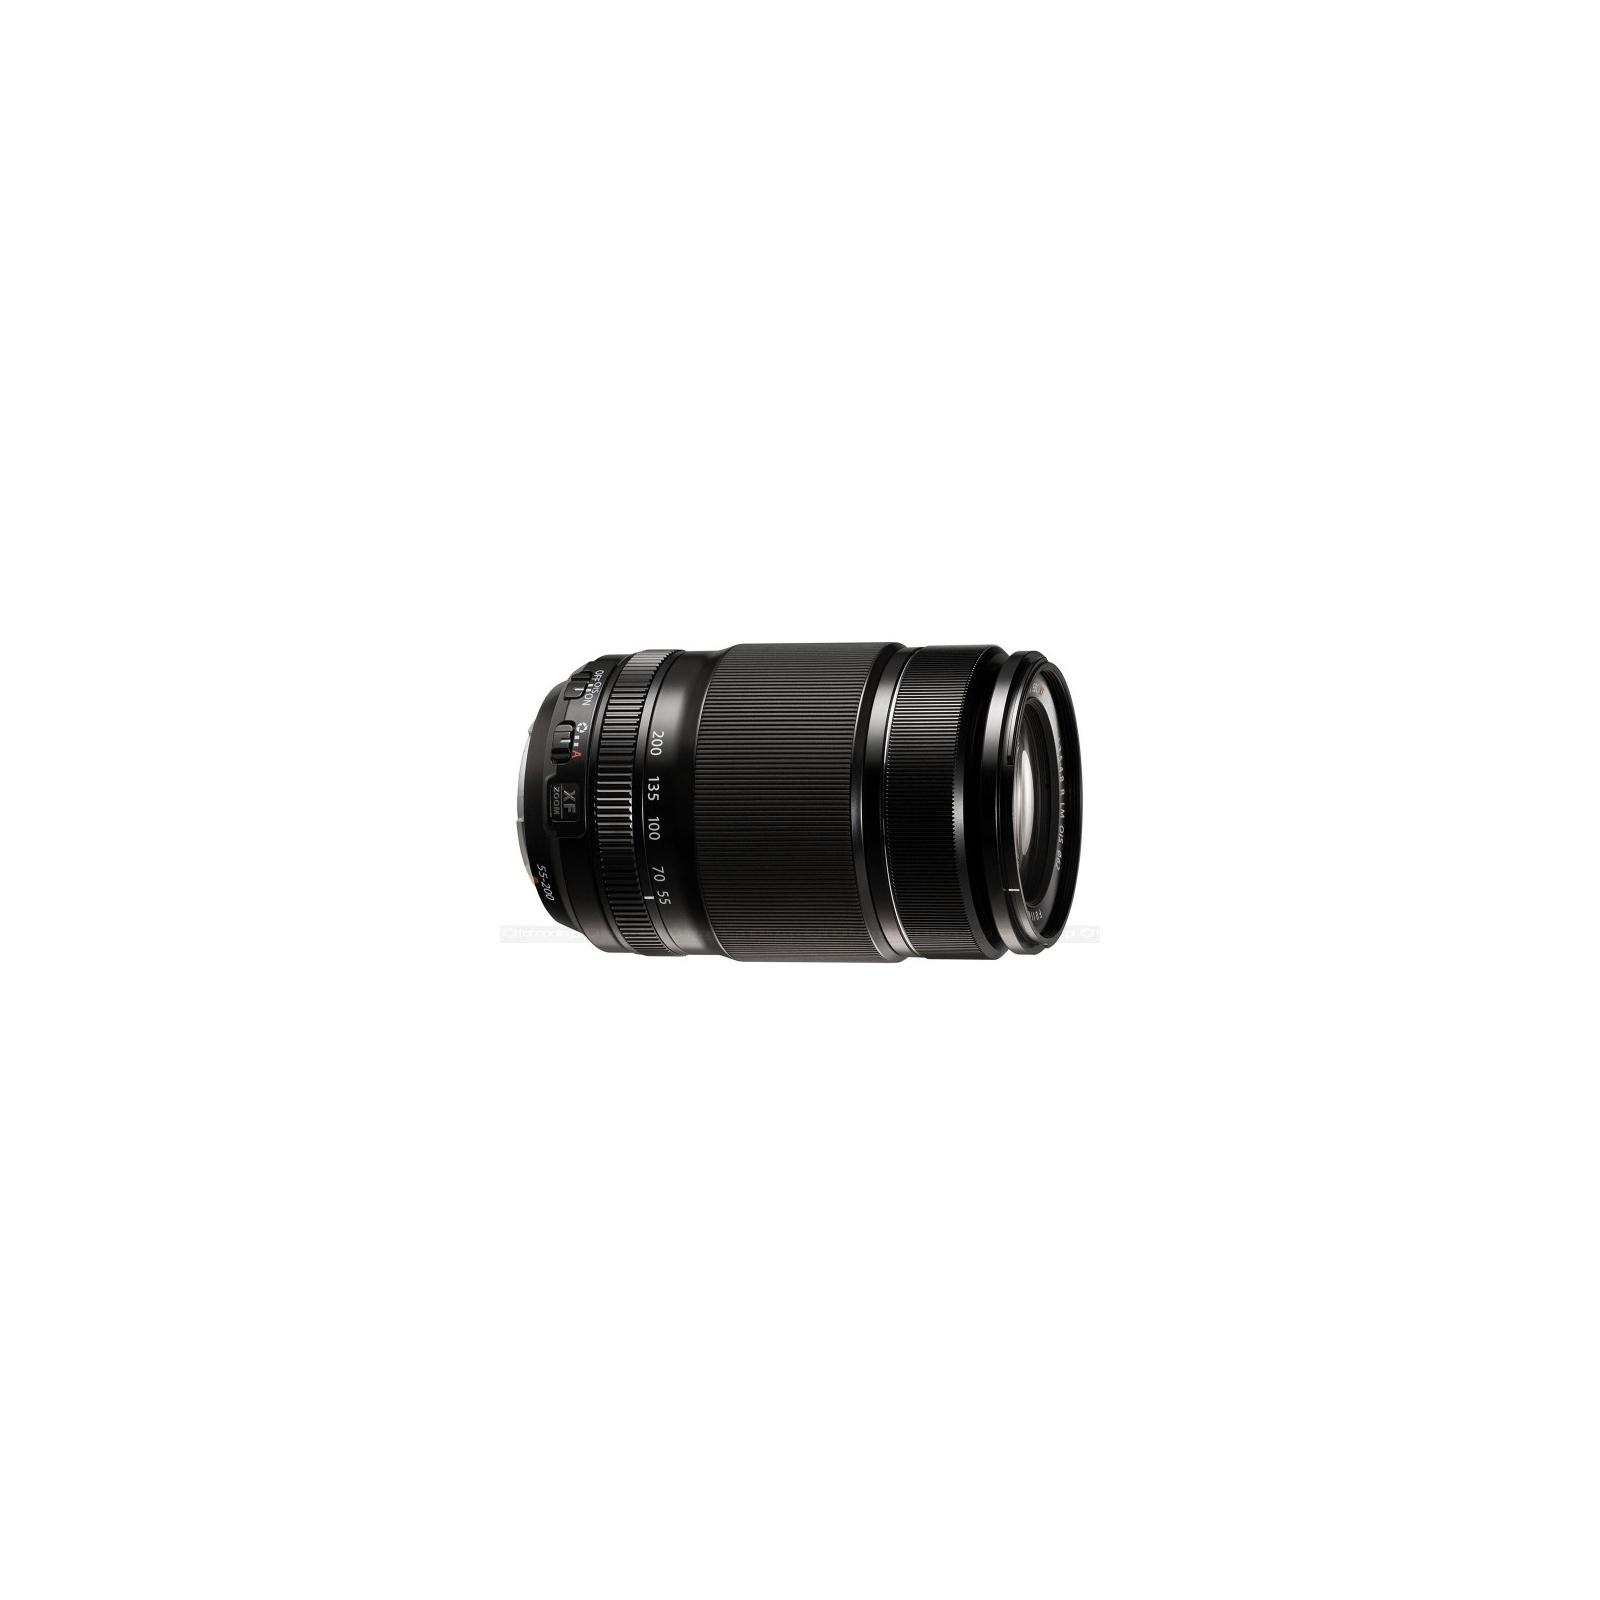 Объектив Fujifilm XF 55-200mm F3.5-4.8 OIS (16384941) изображение 3